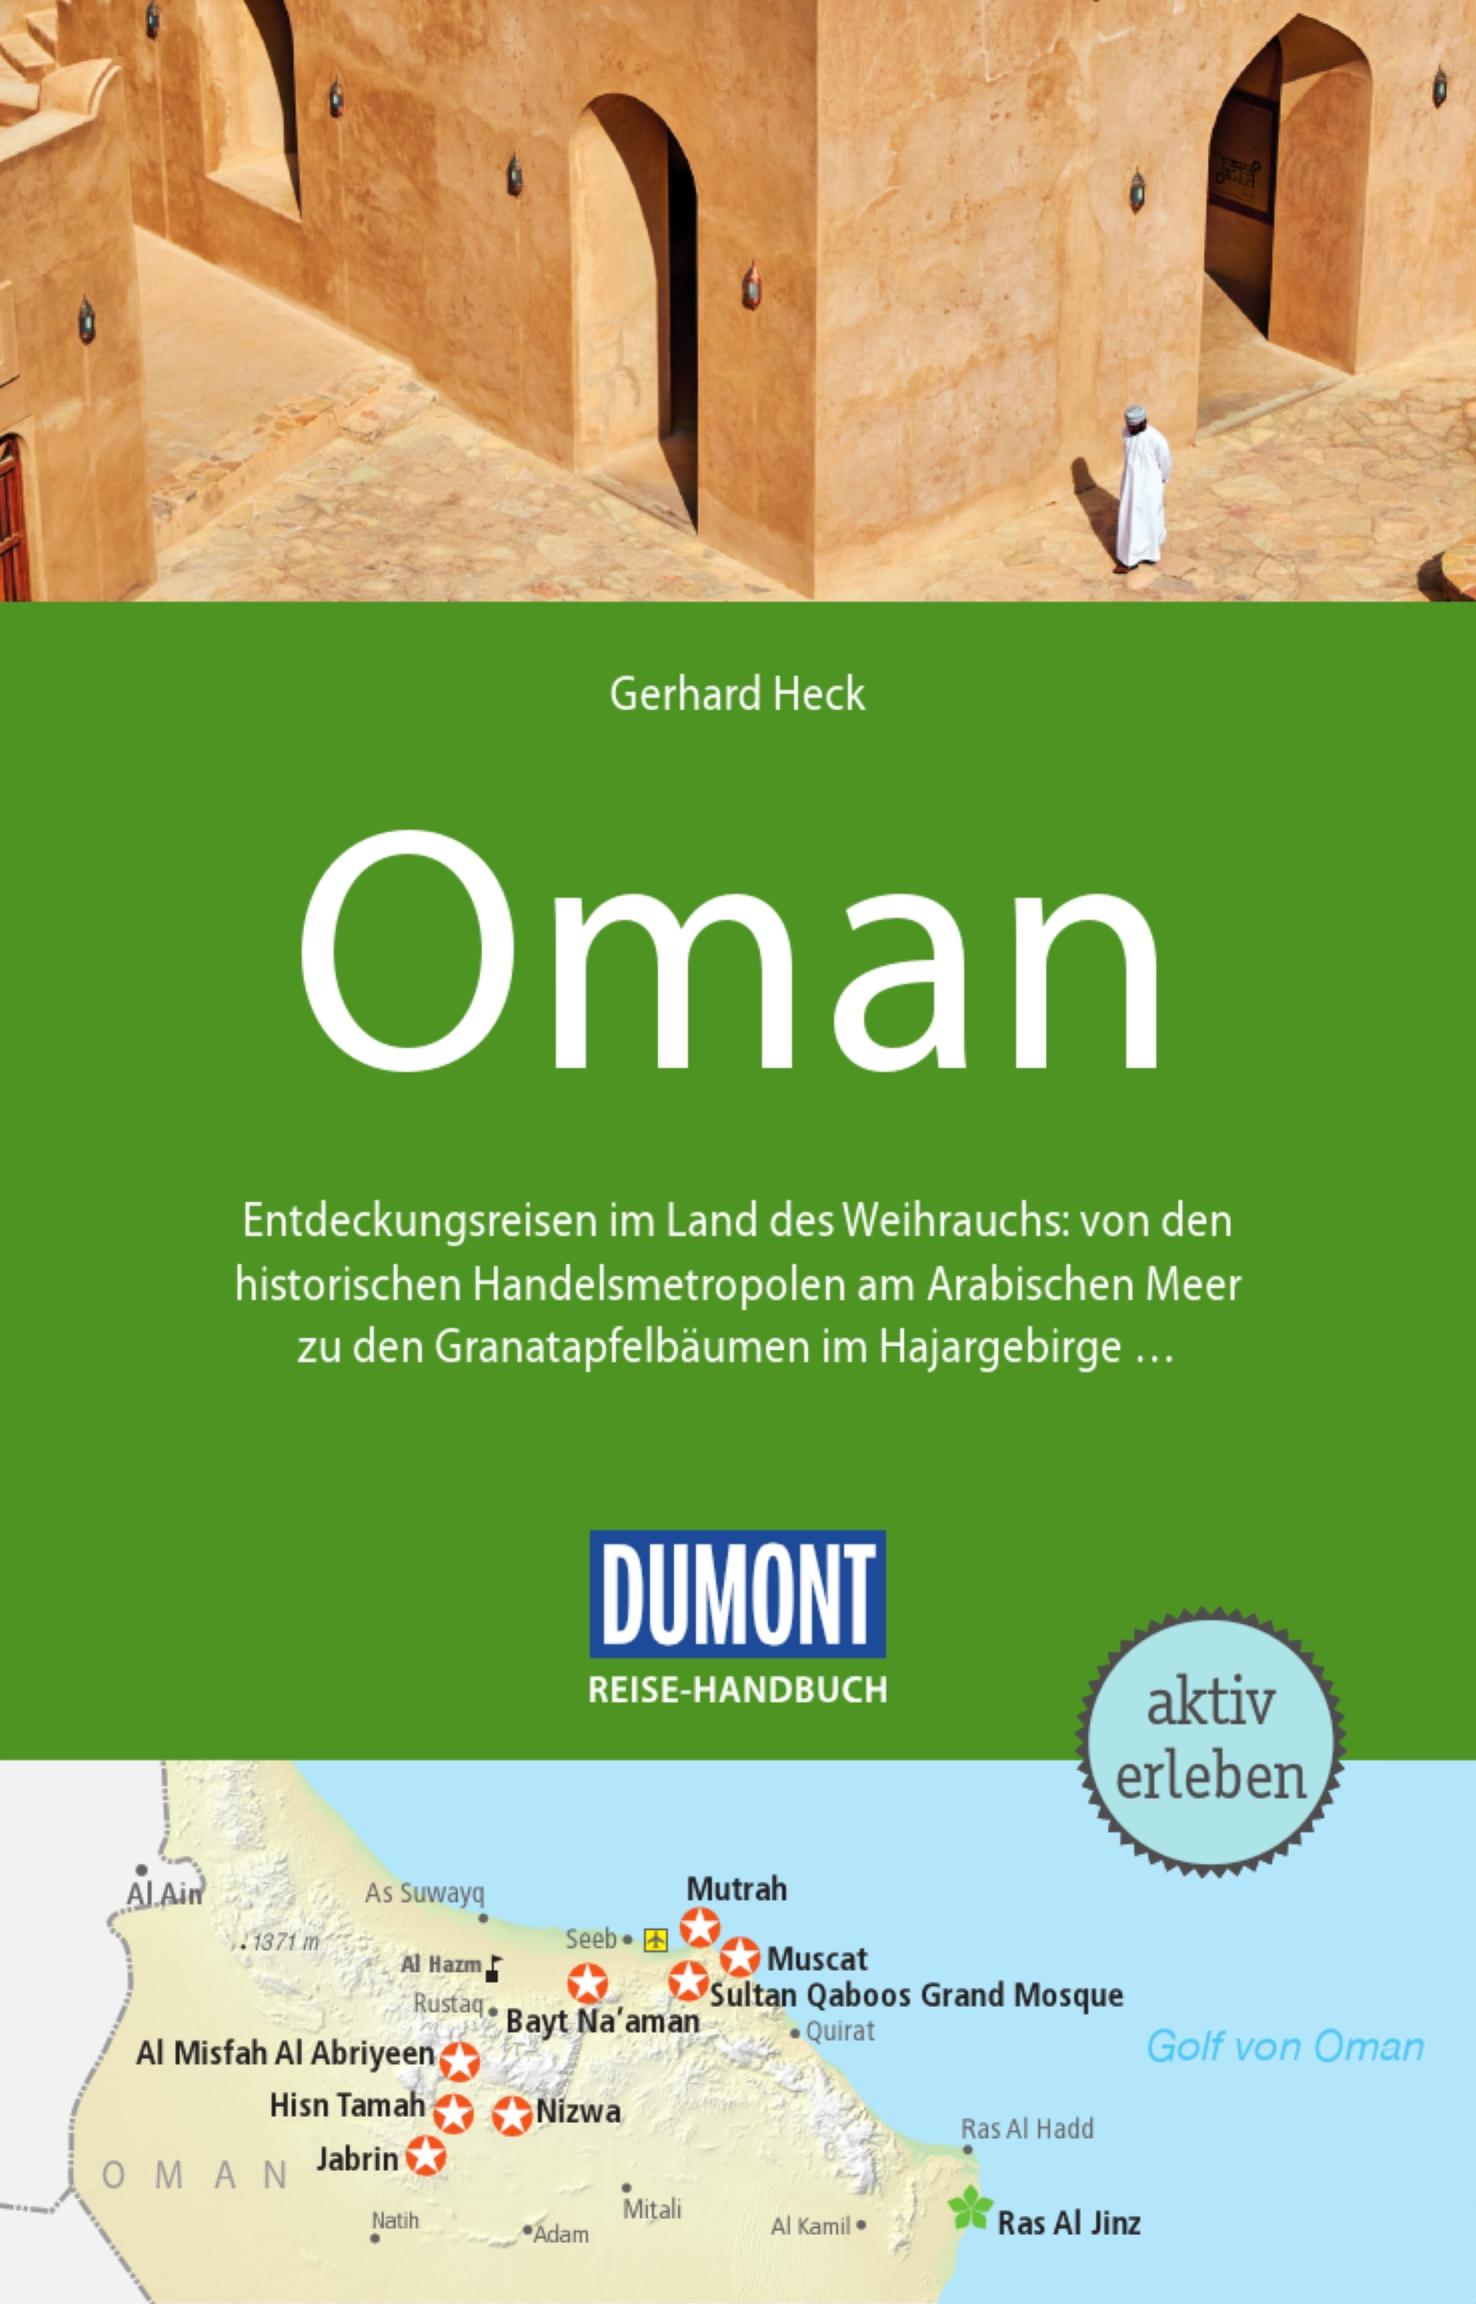 DuMont Reise-Handbuch - Oman(Cover)